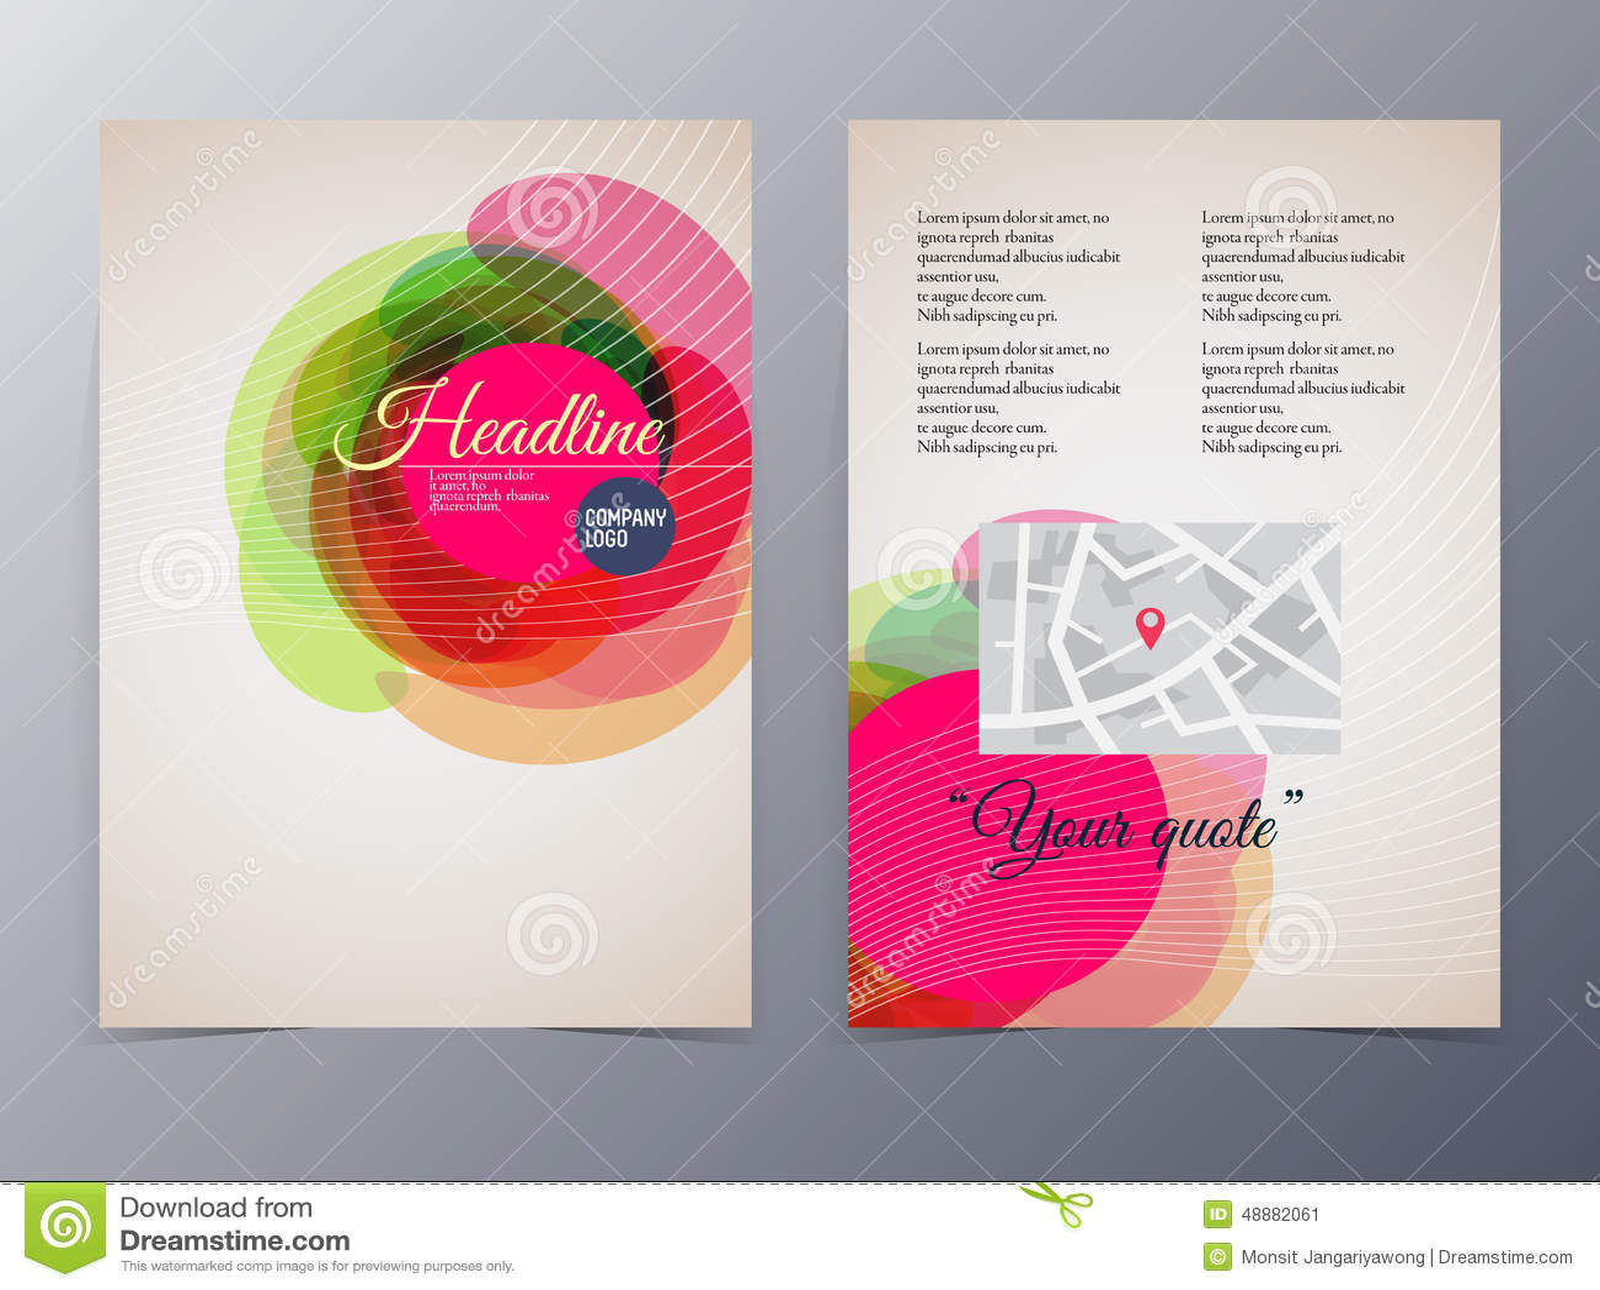 Graphic design flyer templates evozym design flyer templates colorful graphic design element flyer template saigontimesfo